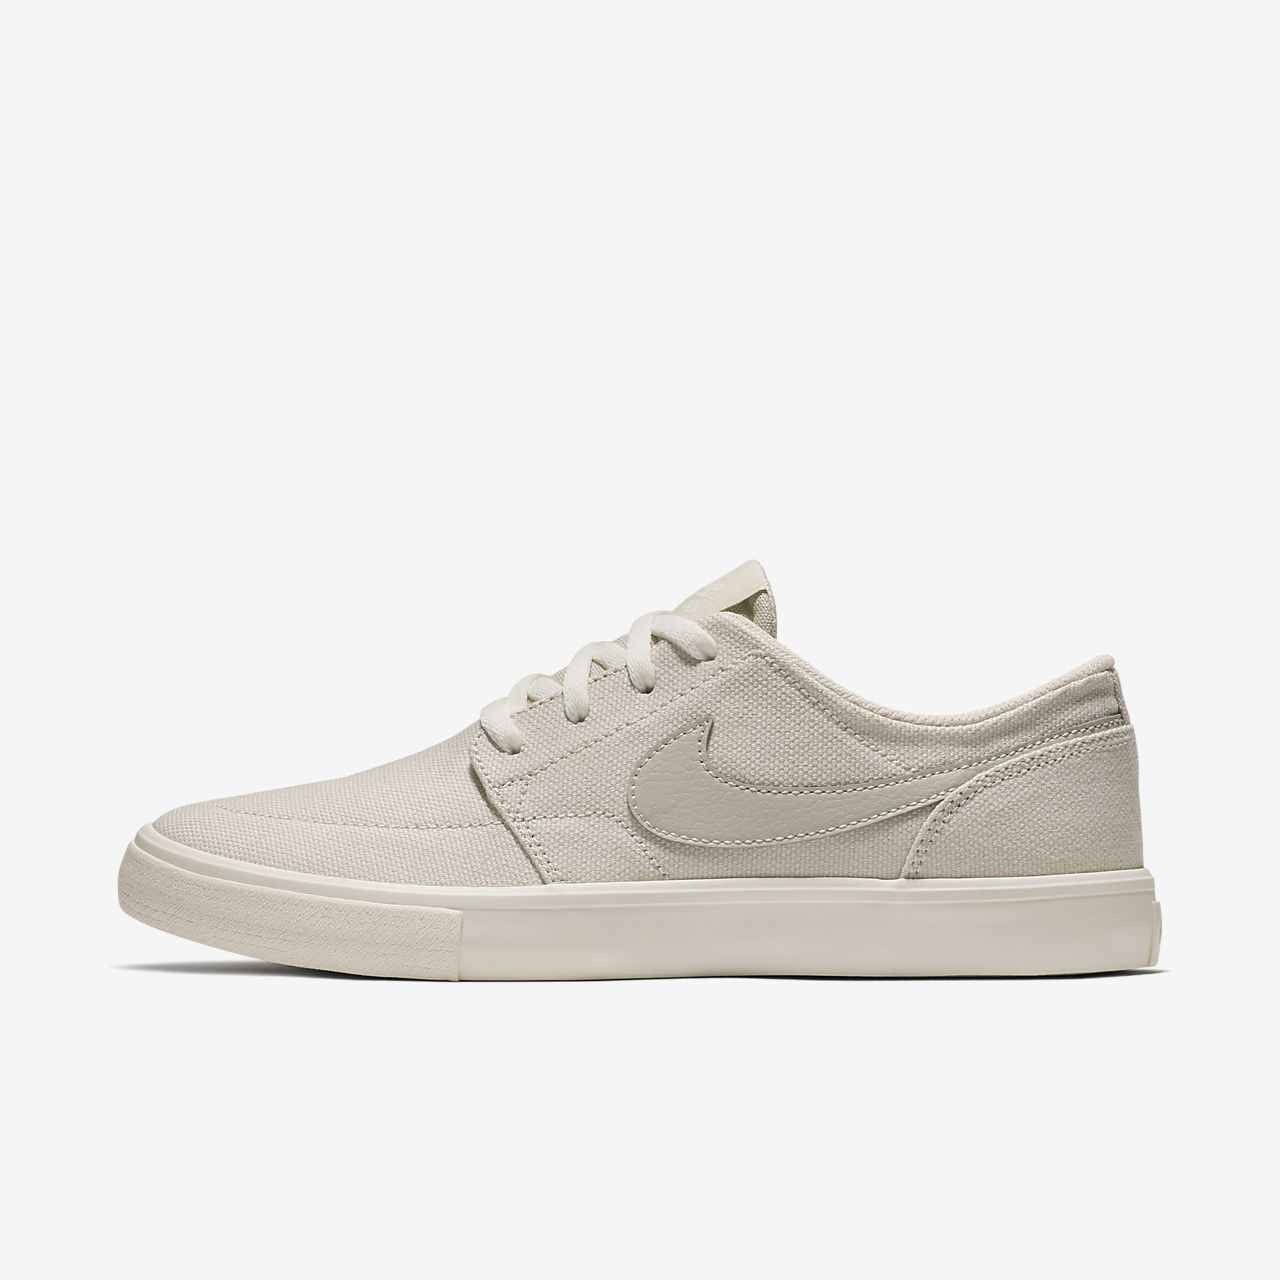 Nike Port Doux Solaire Chaussures Plus Ii Gris xY4oTOfTbS